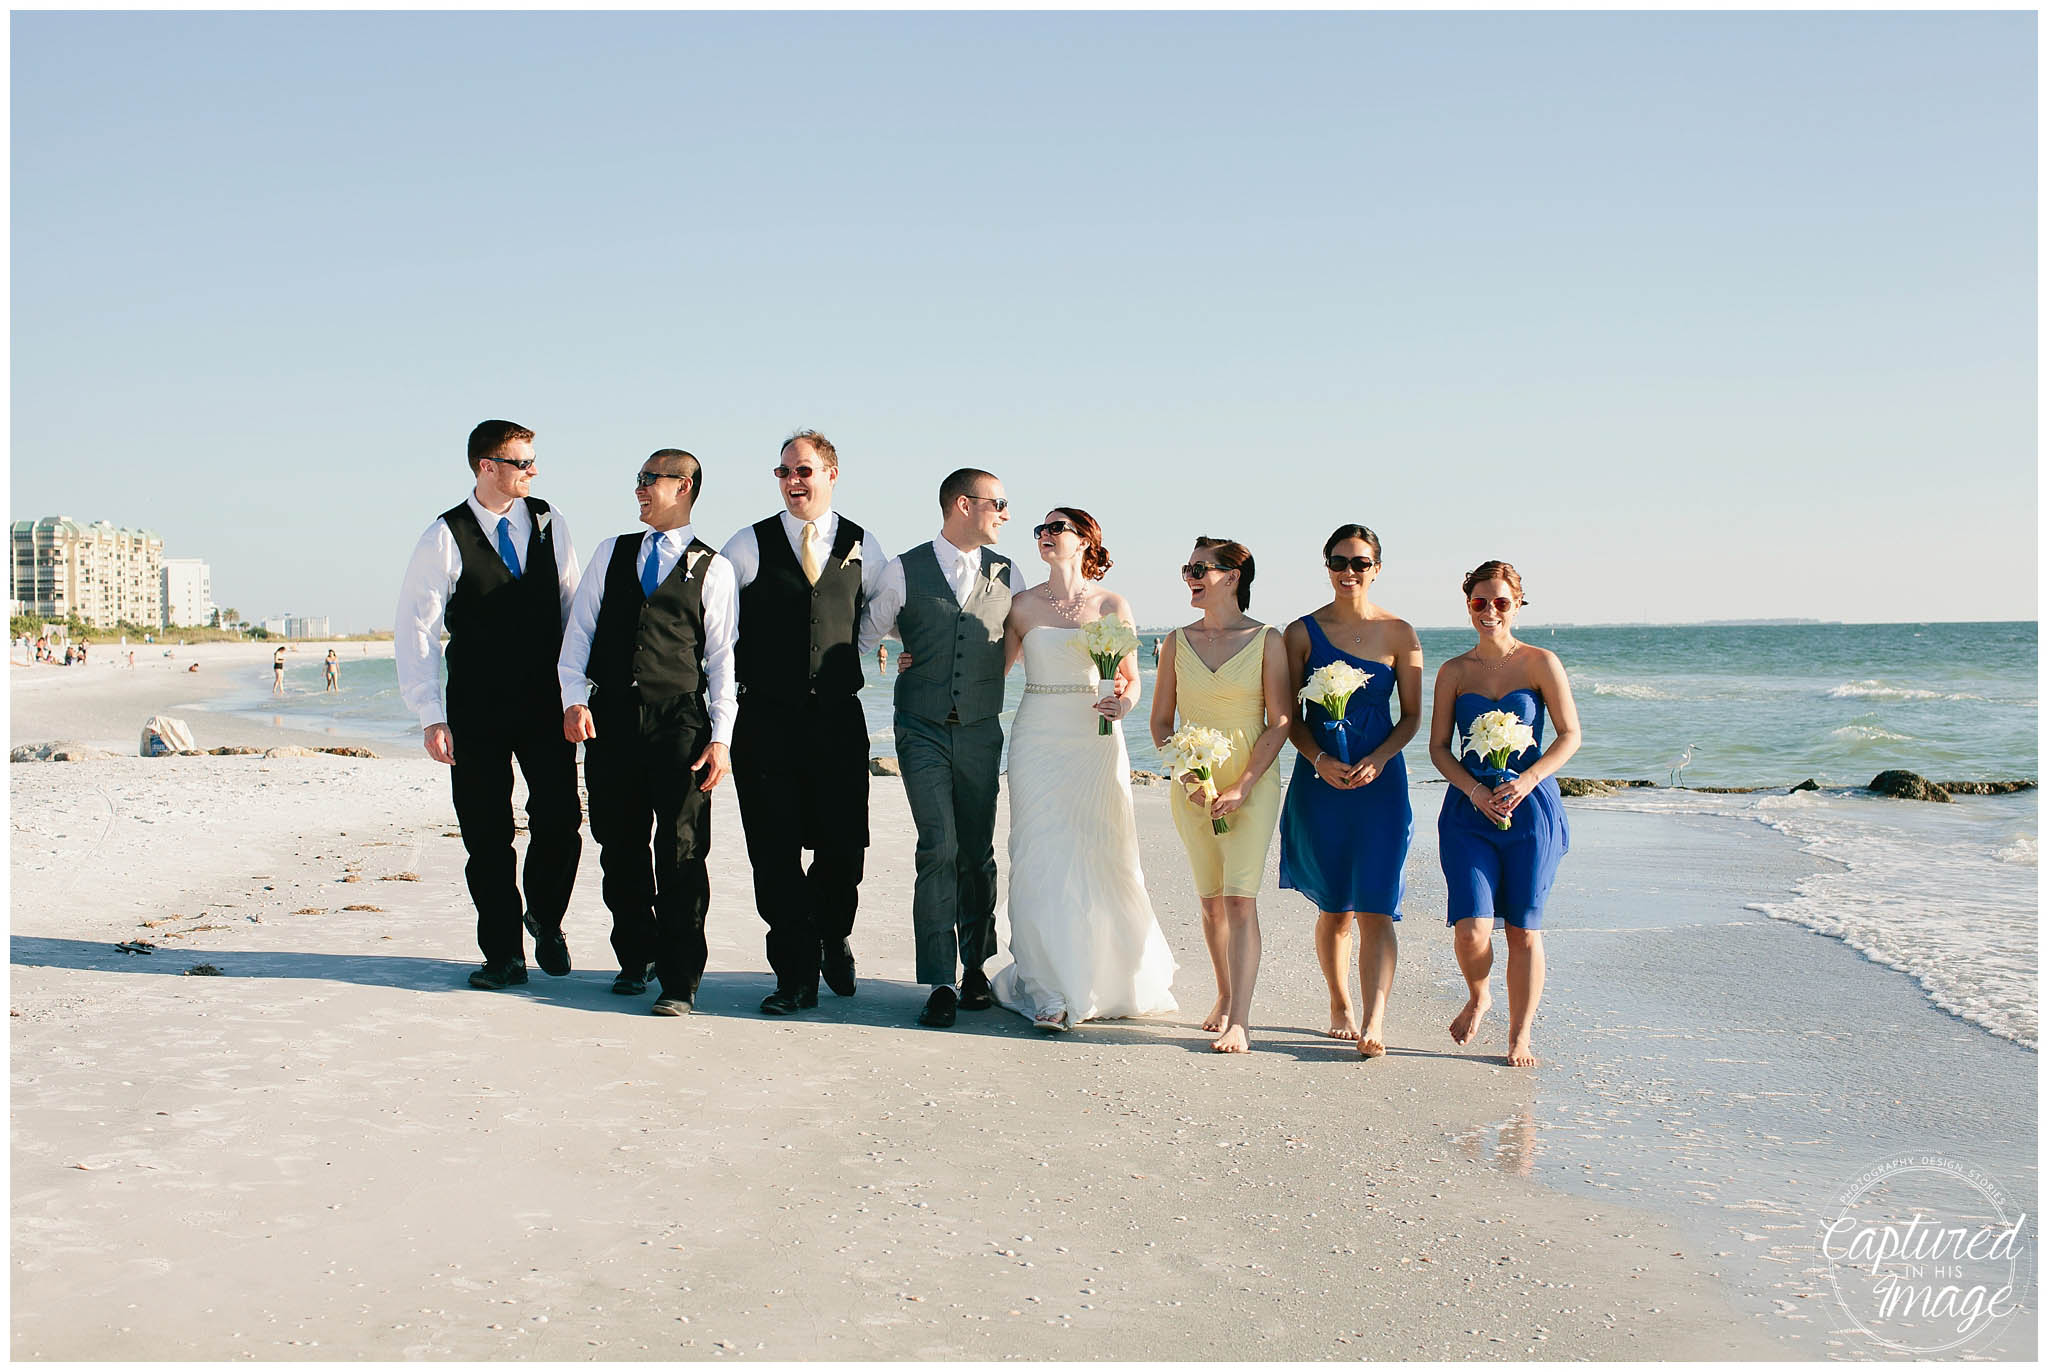 St. Pete Beach Destination Wedding (13 of 81)